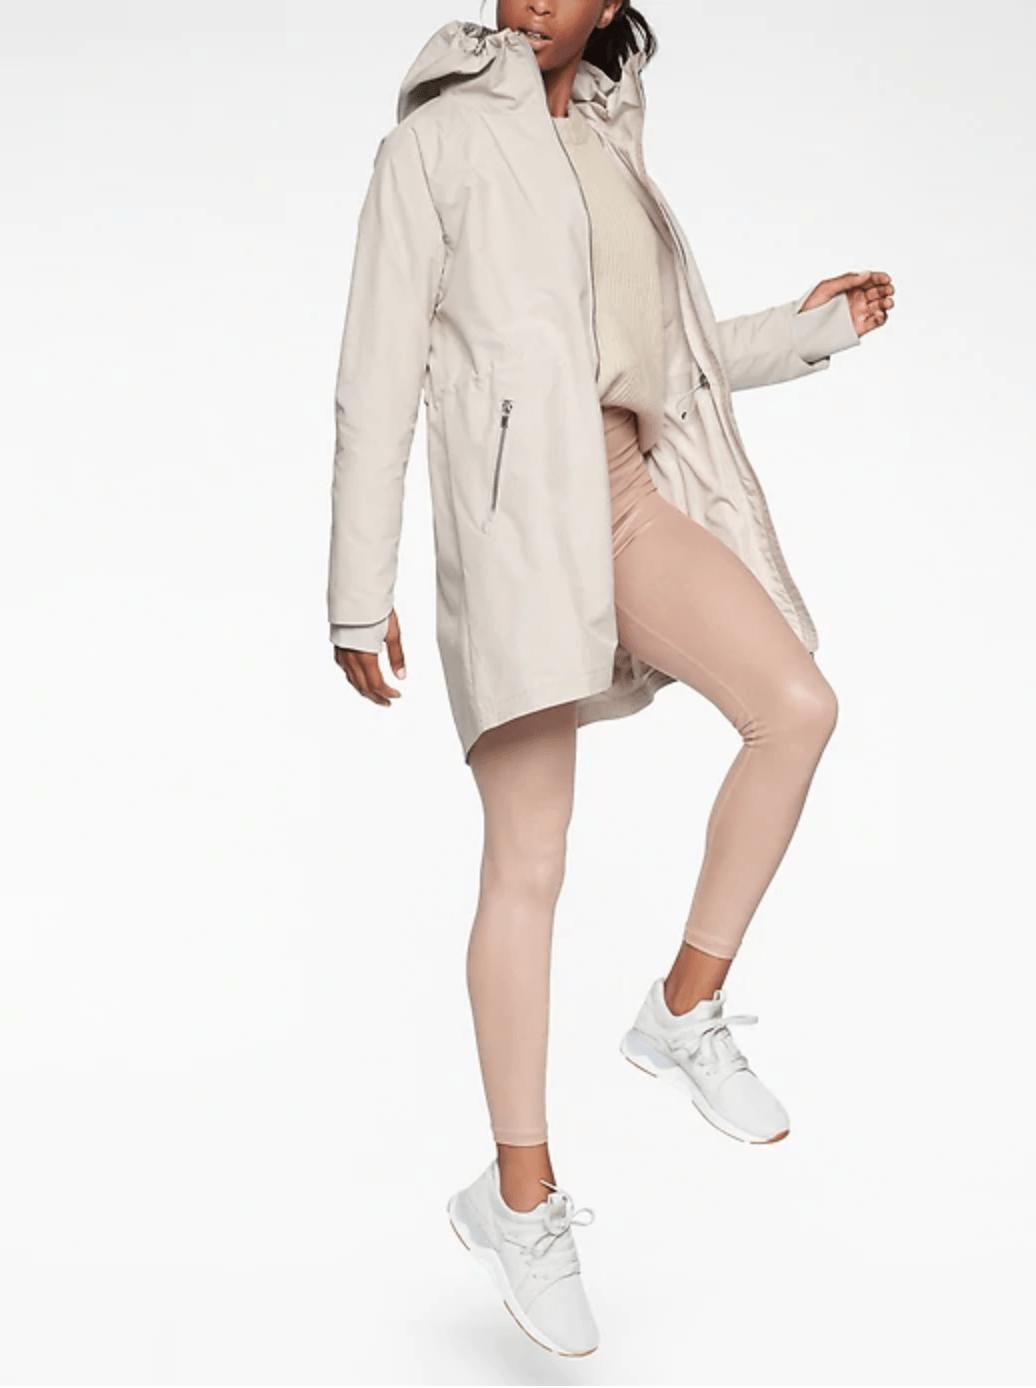 Athleta Womens Cloudburst Jacket